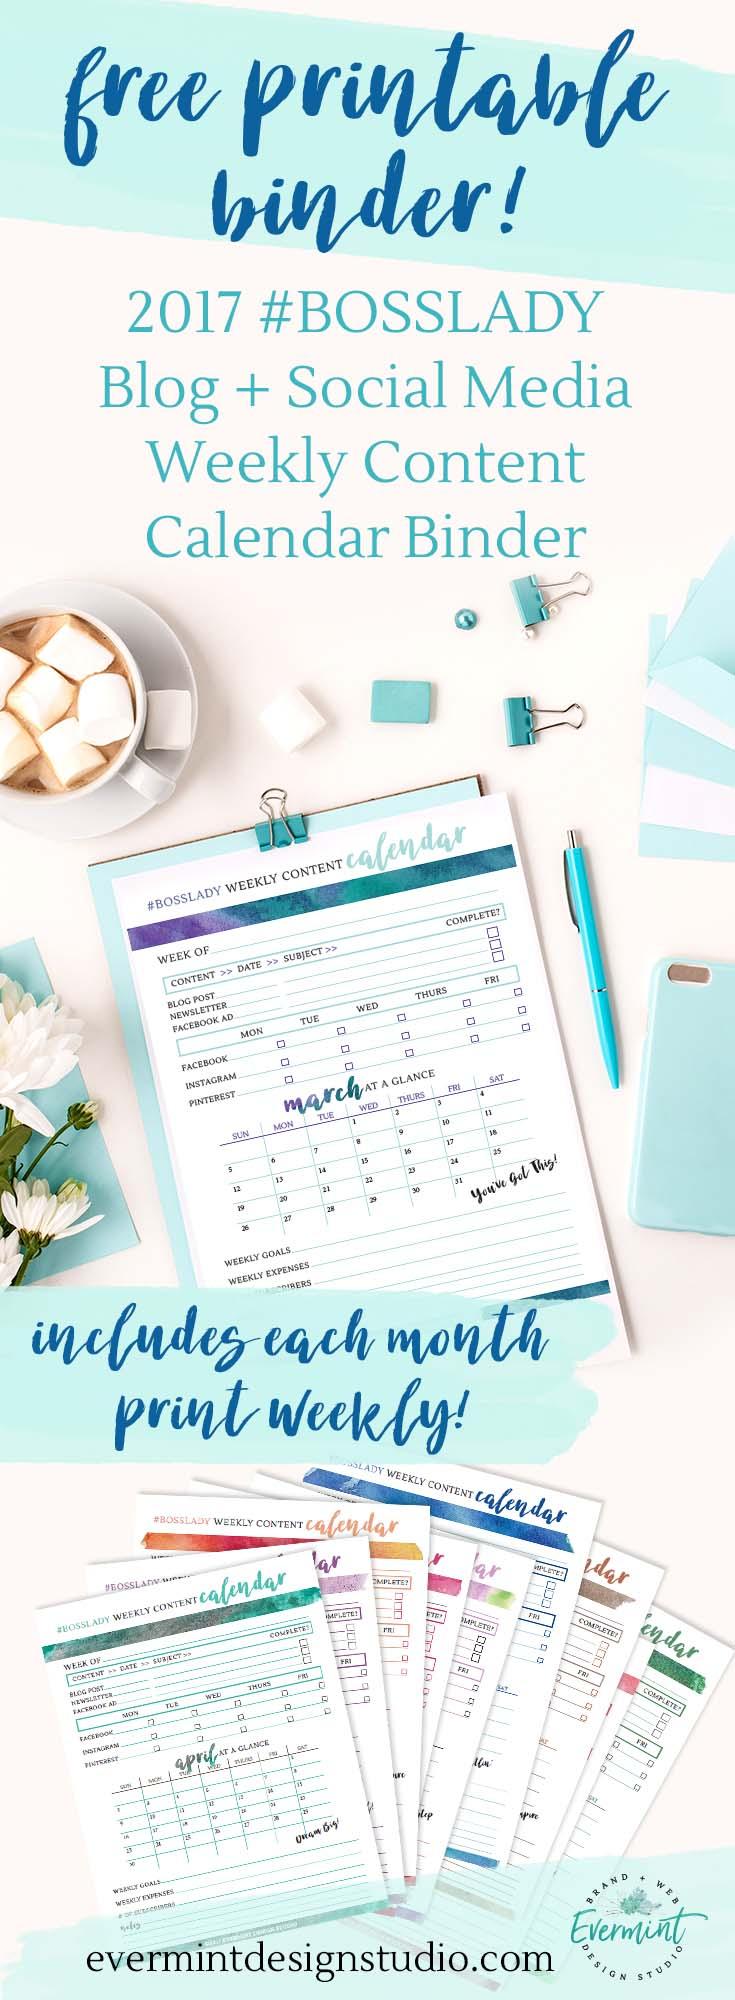 Blog + Social Media weekly content calendar binder